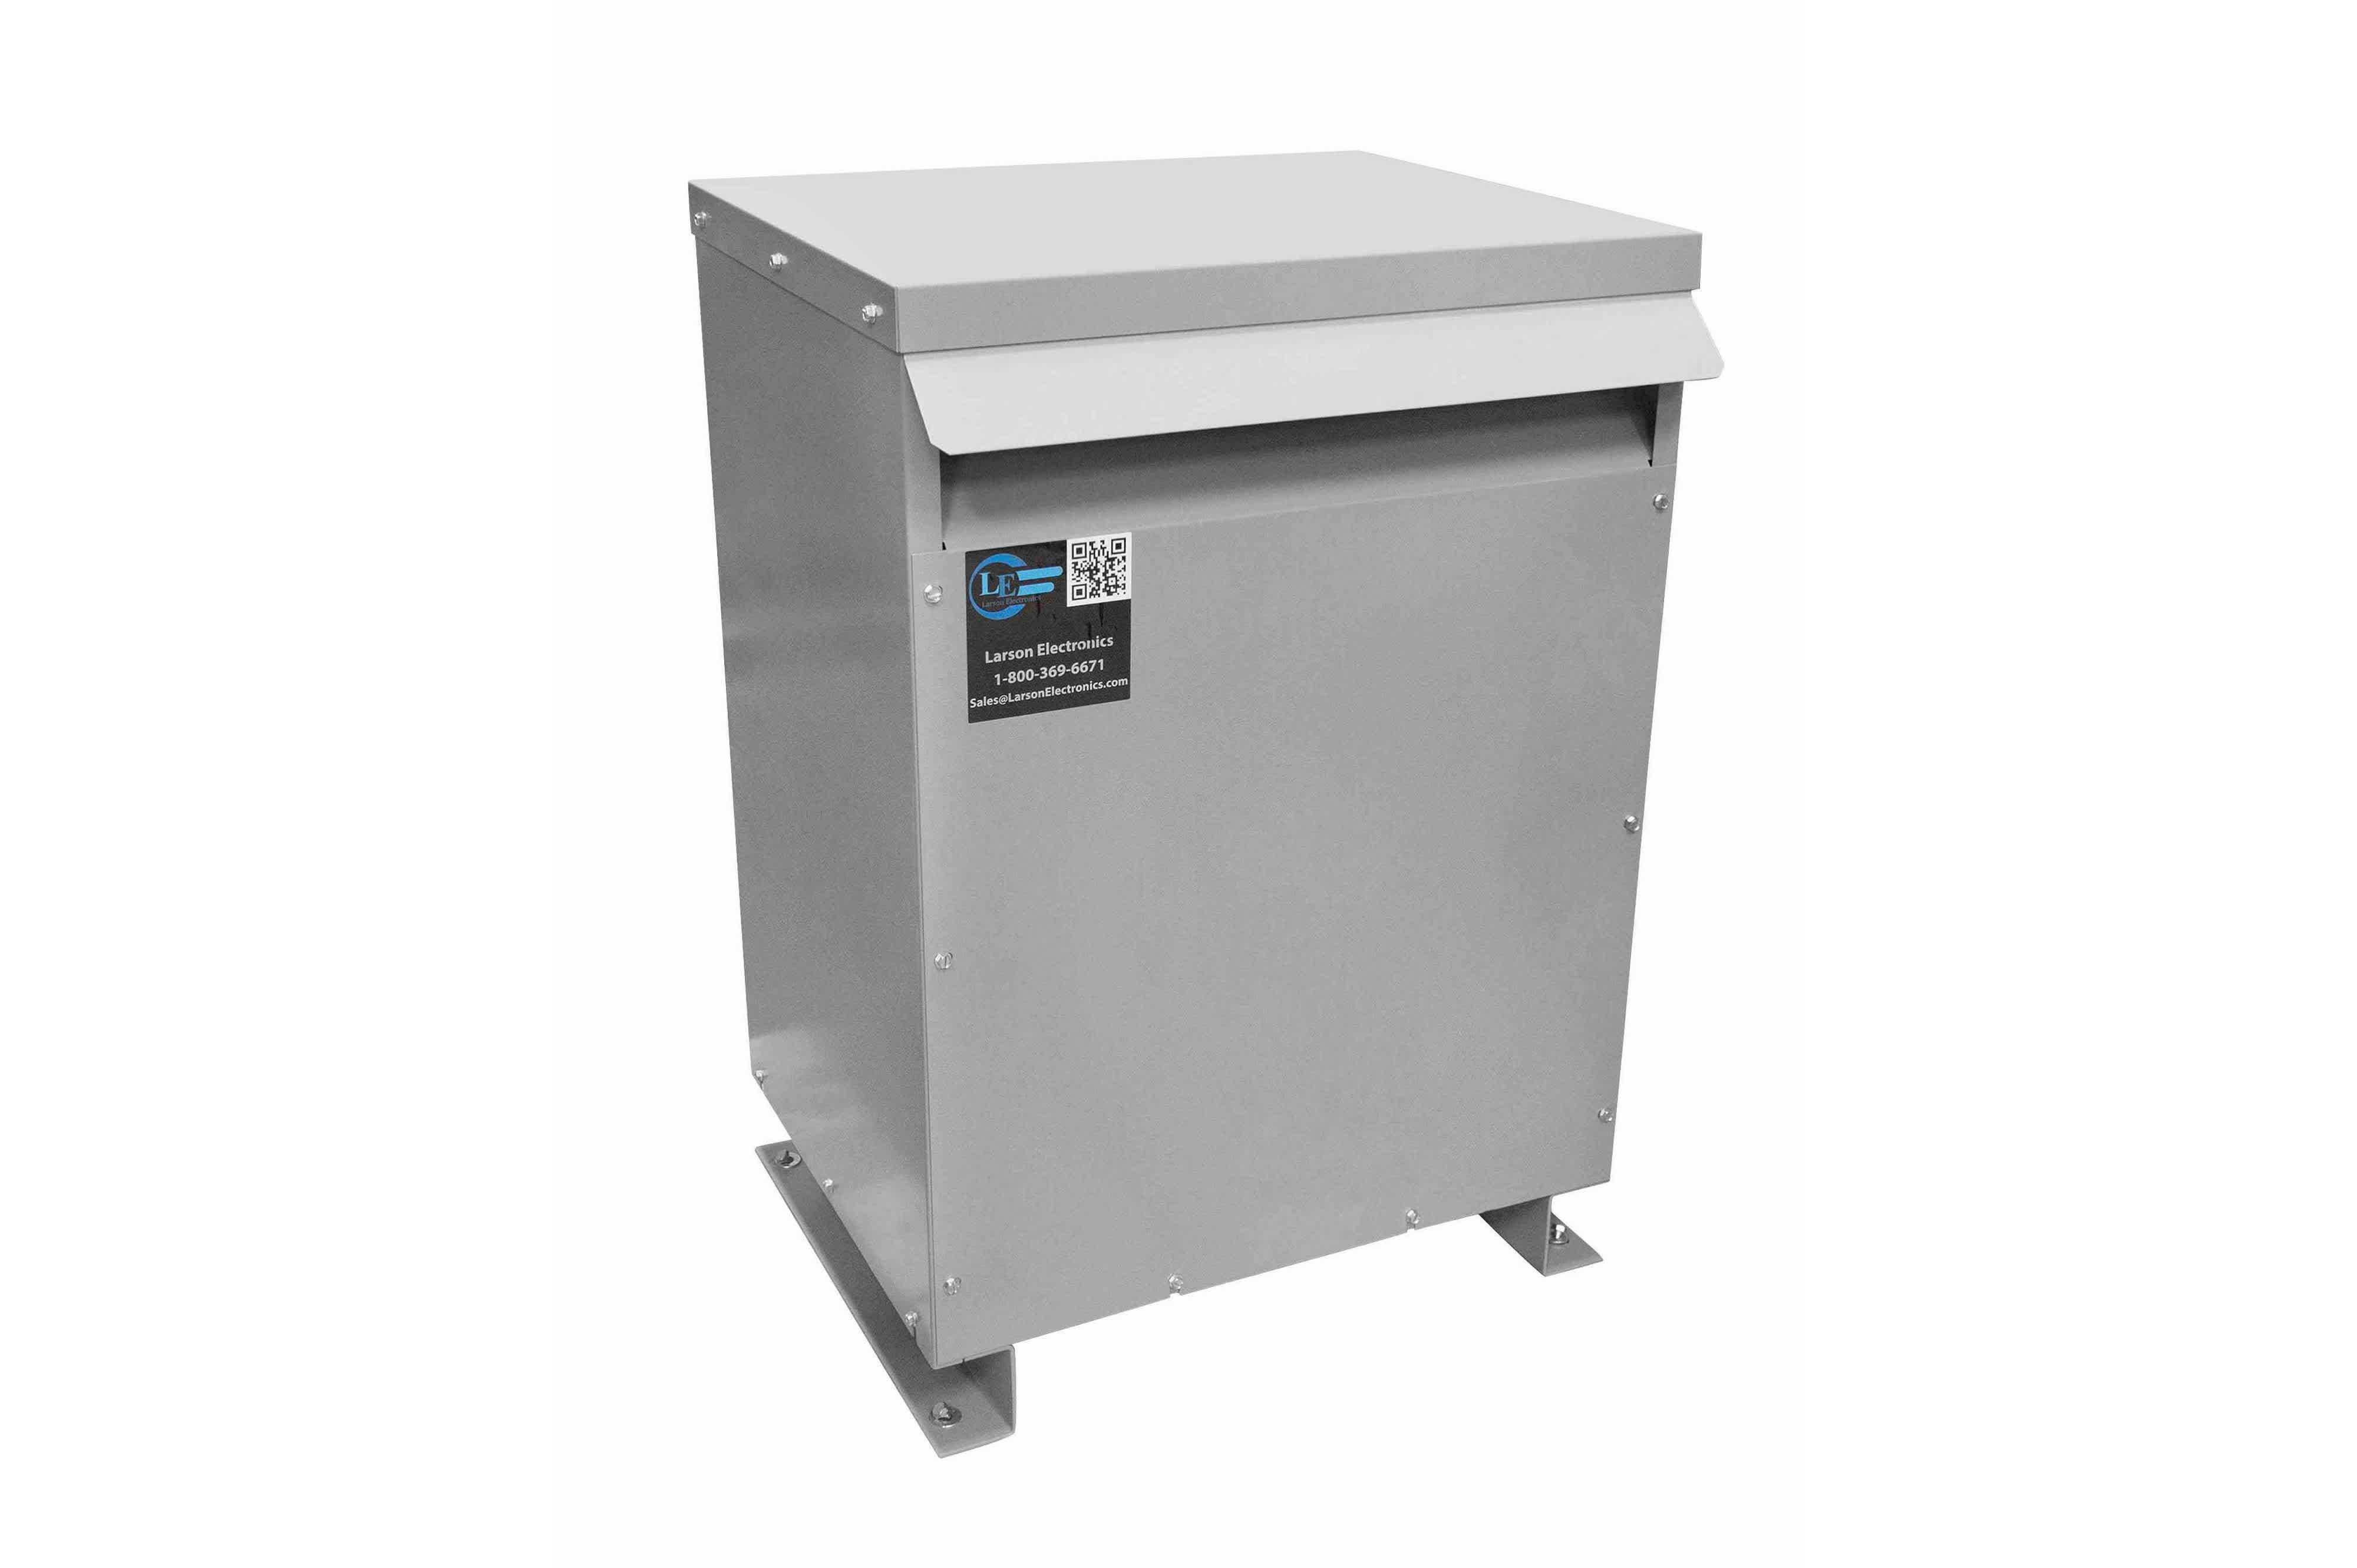 1000 kVA 3PH Isolation Transformer, 480V Wye Primary, 415Y/240 Wye-N Secondary, N3R, Ventilated, 60 Hz